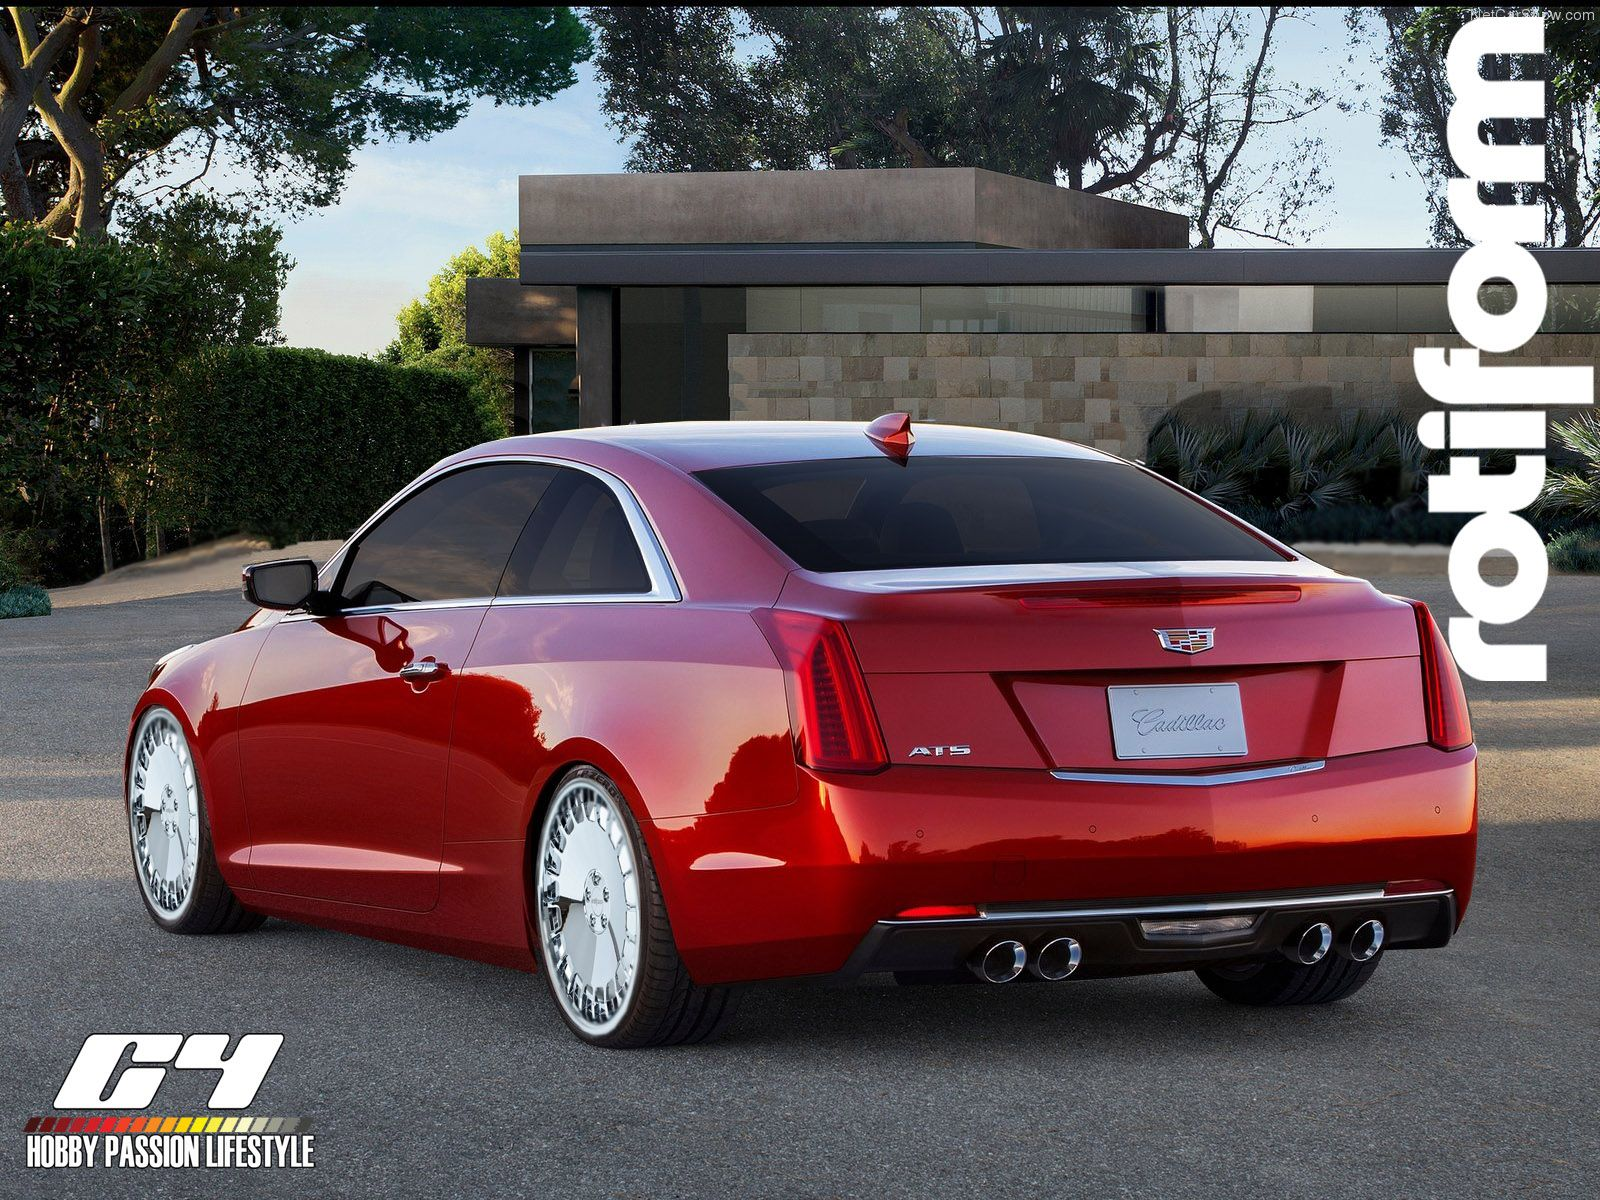 Cadillac Ats Coupe Custom Cadillac Caddy Gm Ats Rotiforms